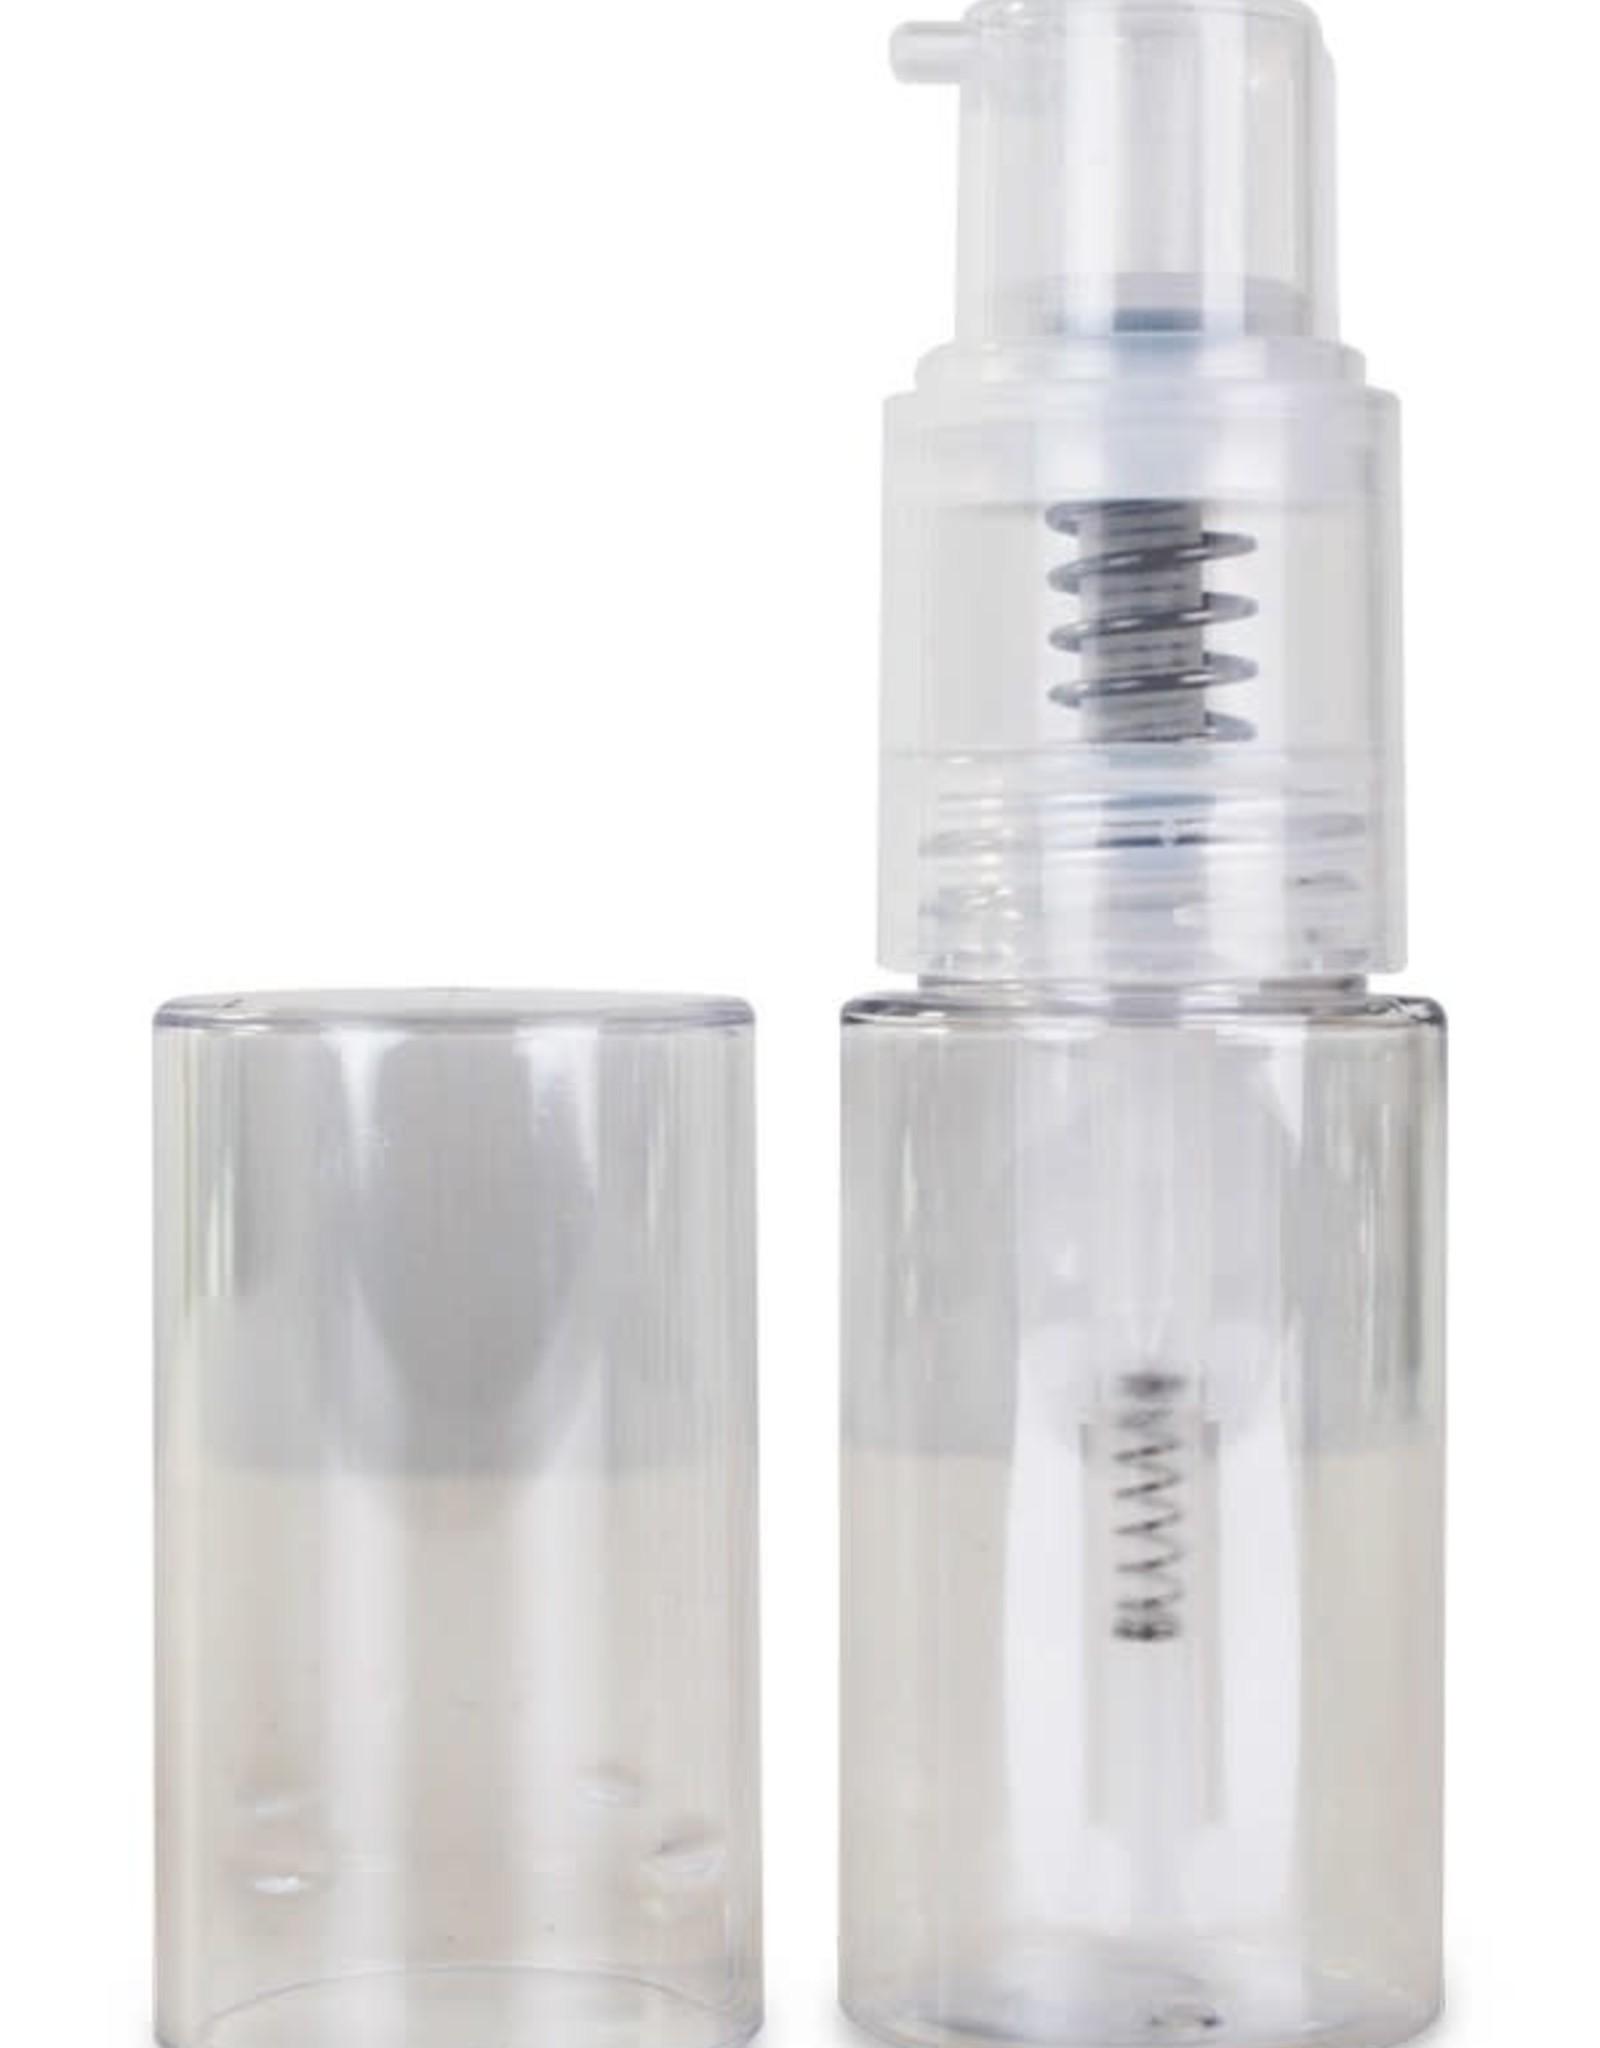 PartyXplosion PXP Professional Colours Glitter spray flesje 35ml